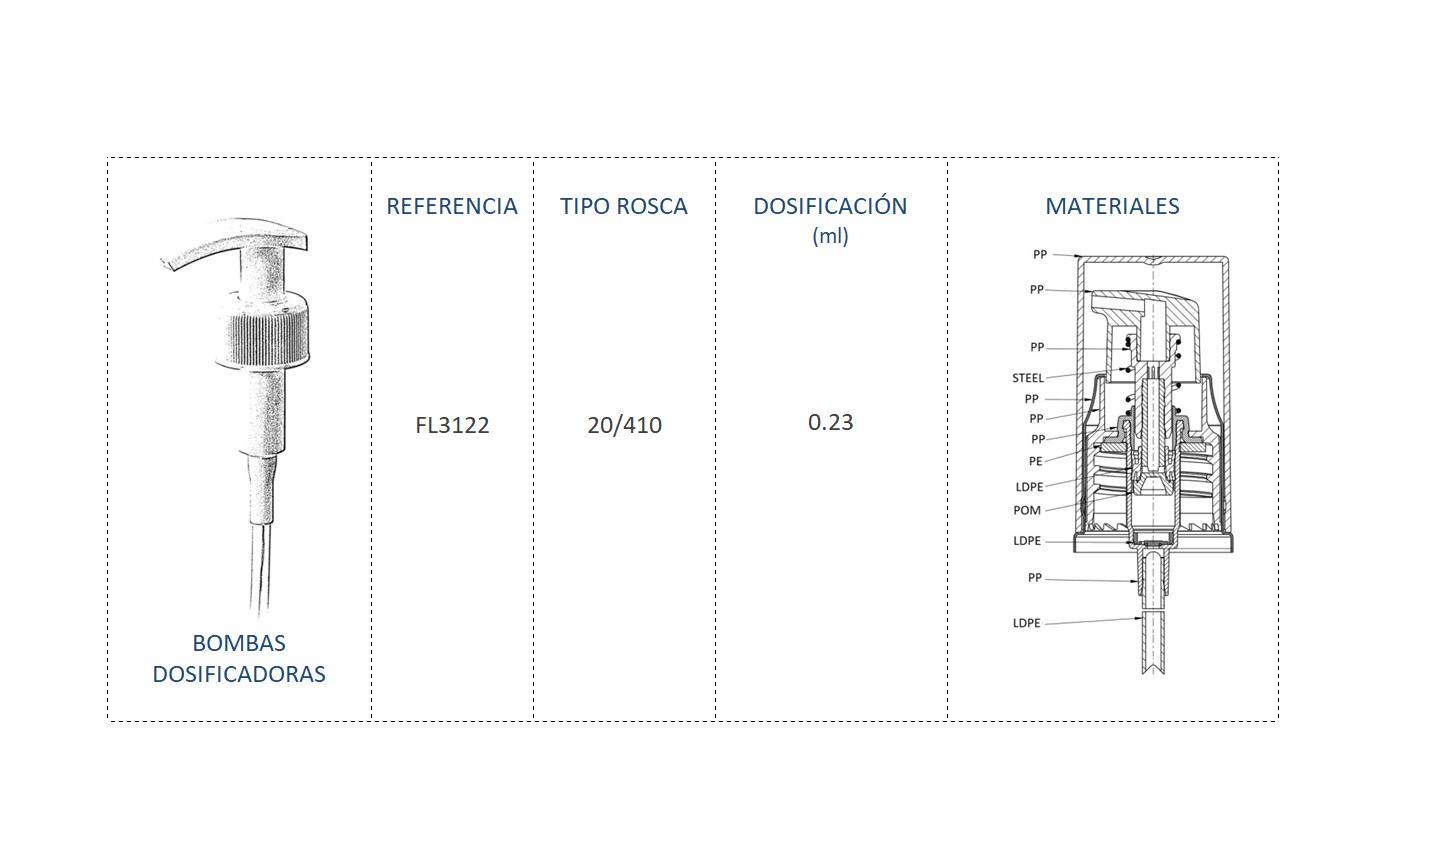 Cuadro de materiales bomba dosificadora FL3122 20/410